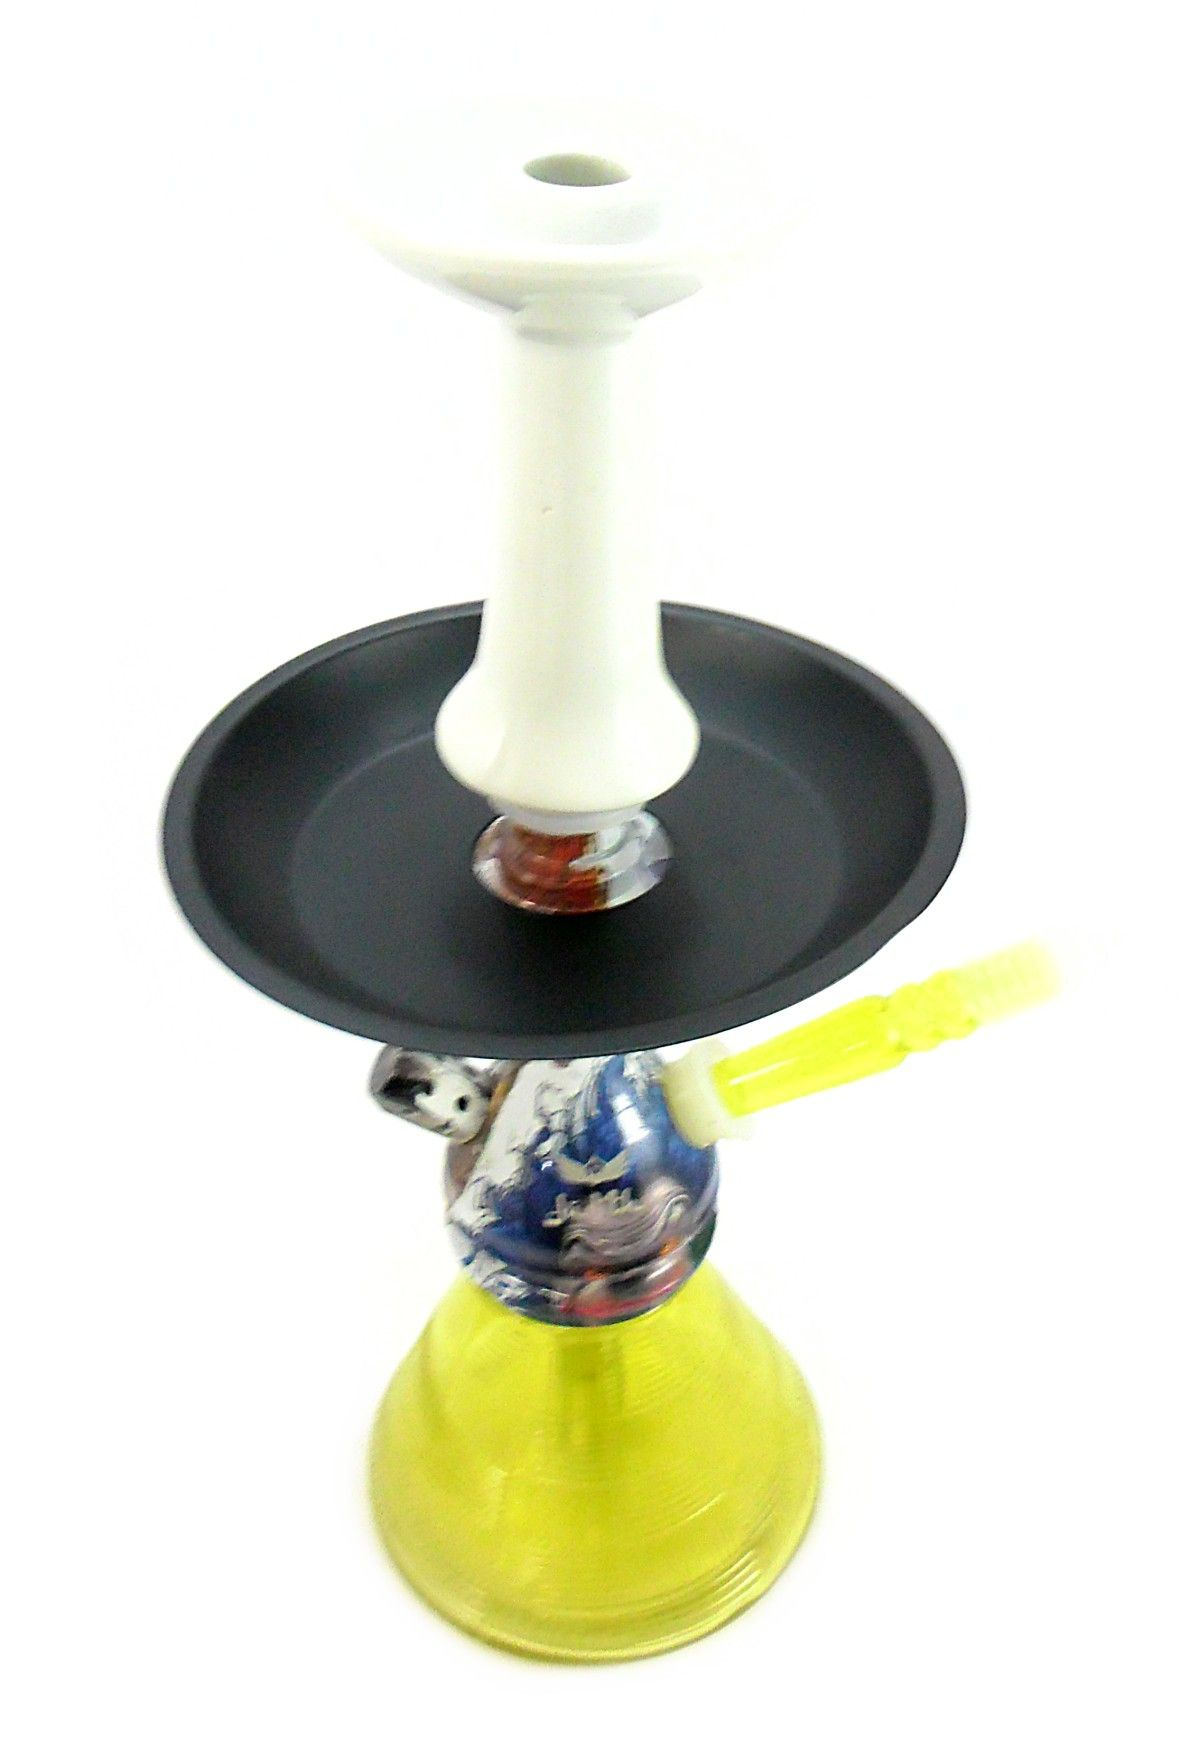 Narguile JUDITH EVIL CLOWN 33cm. Vaso Petit Amarelo, mangueira MD Hose Amar, prato pintado Preto, Fornilho Flux Branco